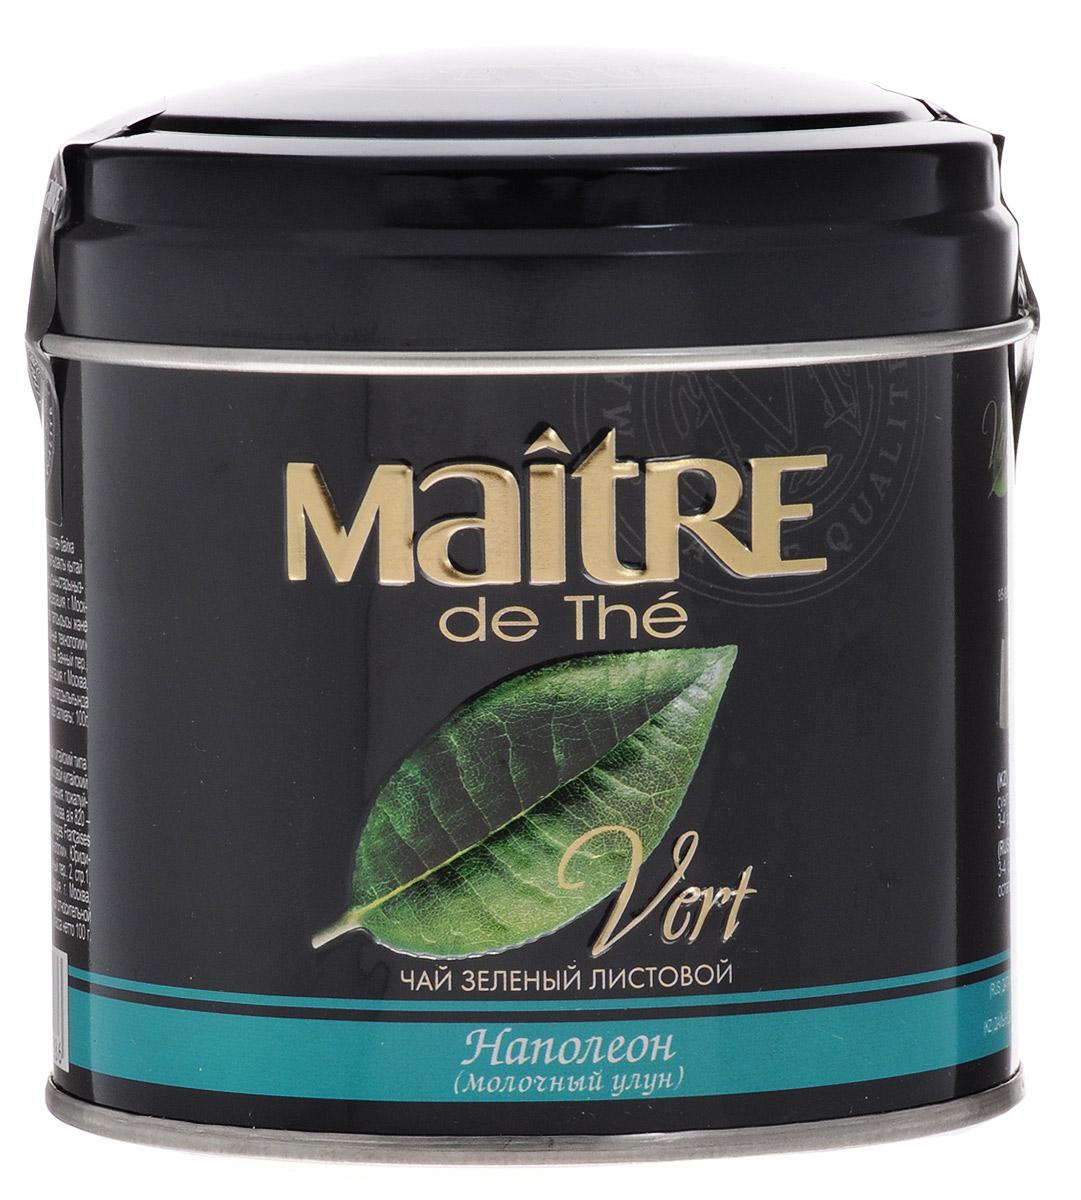 Maitre de The Наполеон (Молочный улун) зеленый листовой чай, 100 г (жестяная банка) maitre de the де люкс зеленый листовой чай 65 г жестяная банка